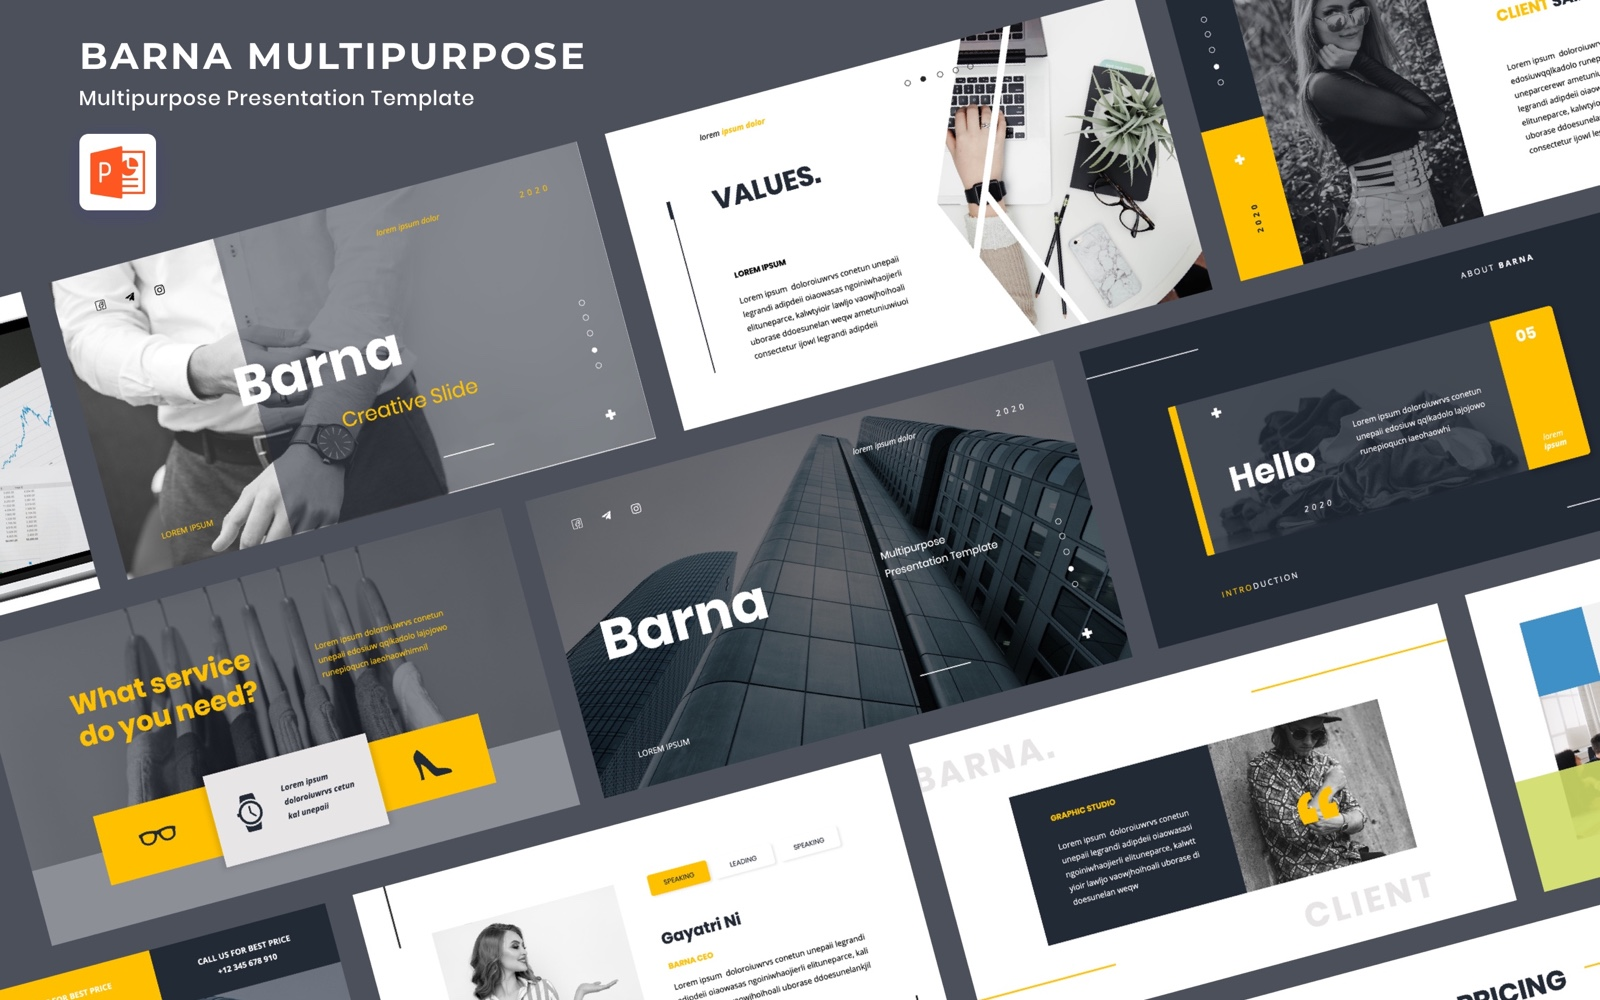 BARNA - Multipurpose PowerPoint Template